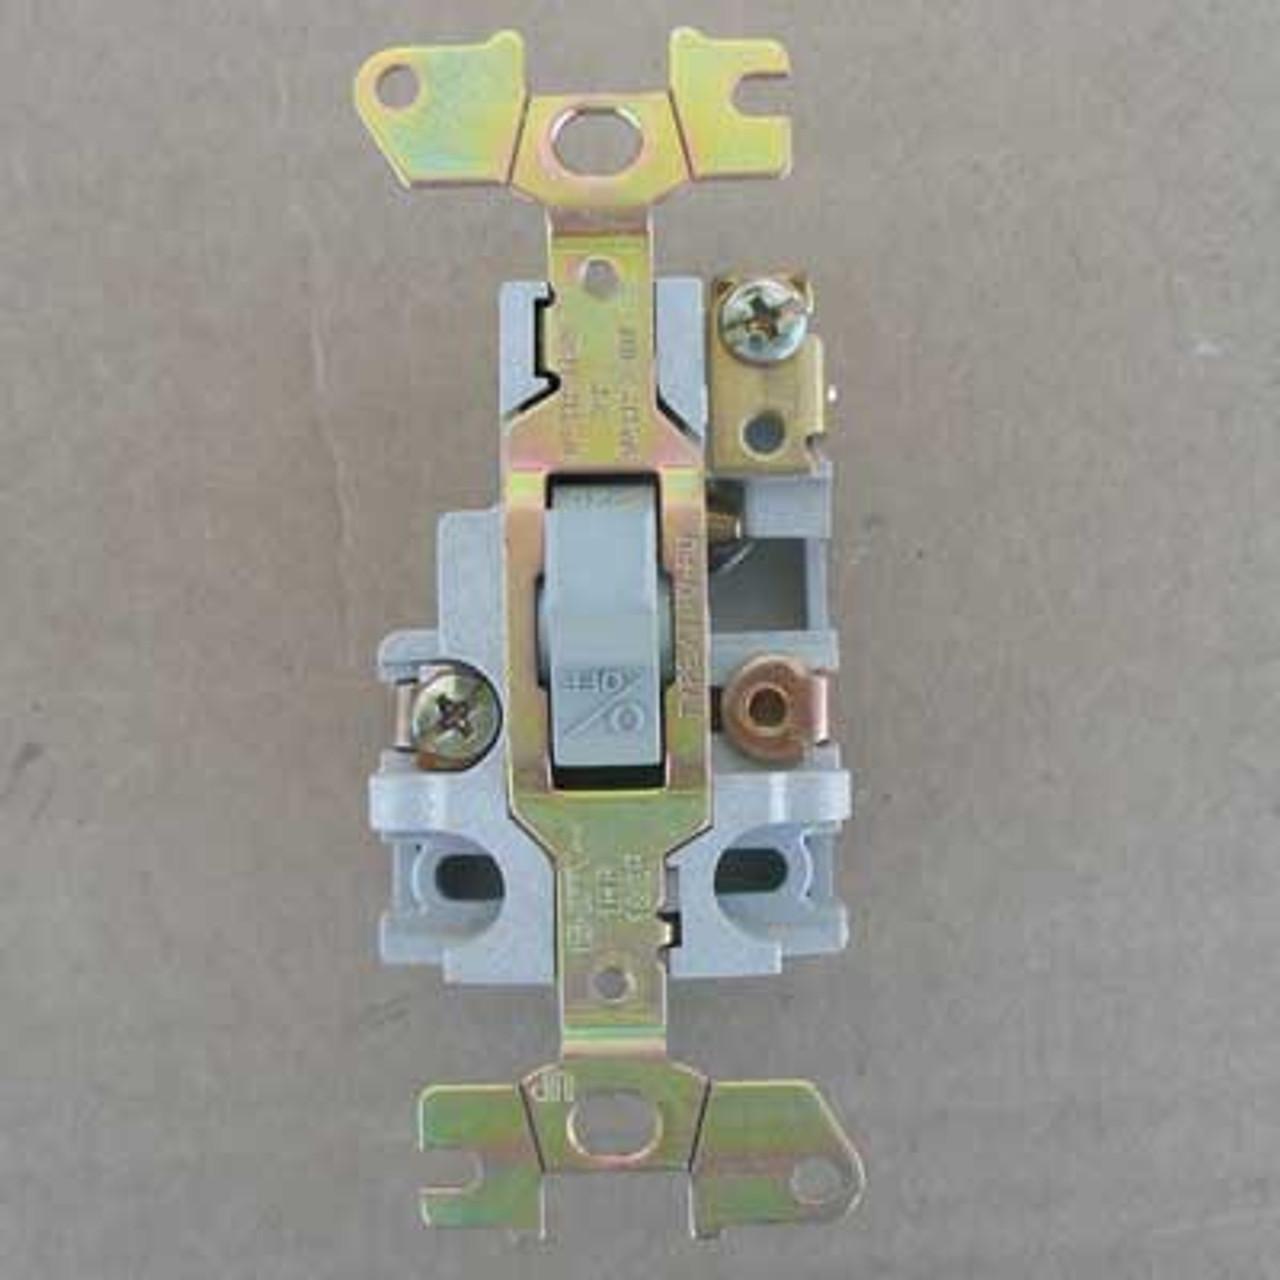 Siemens SMFF01 277 VAC 1 Pole Manual Starter Toggle Switch - New